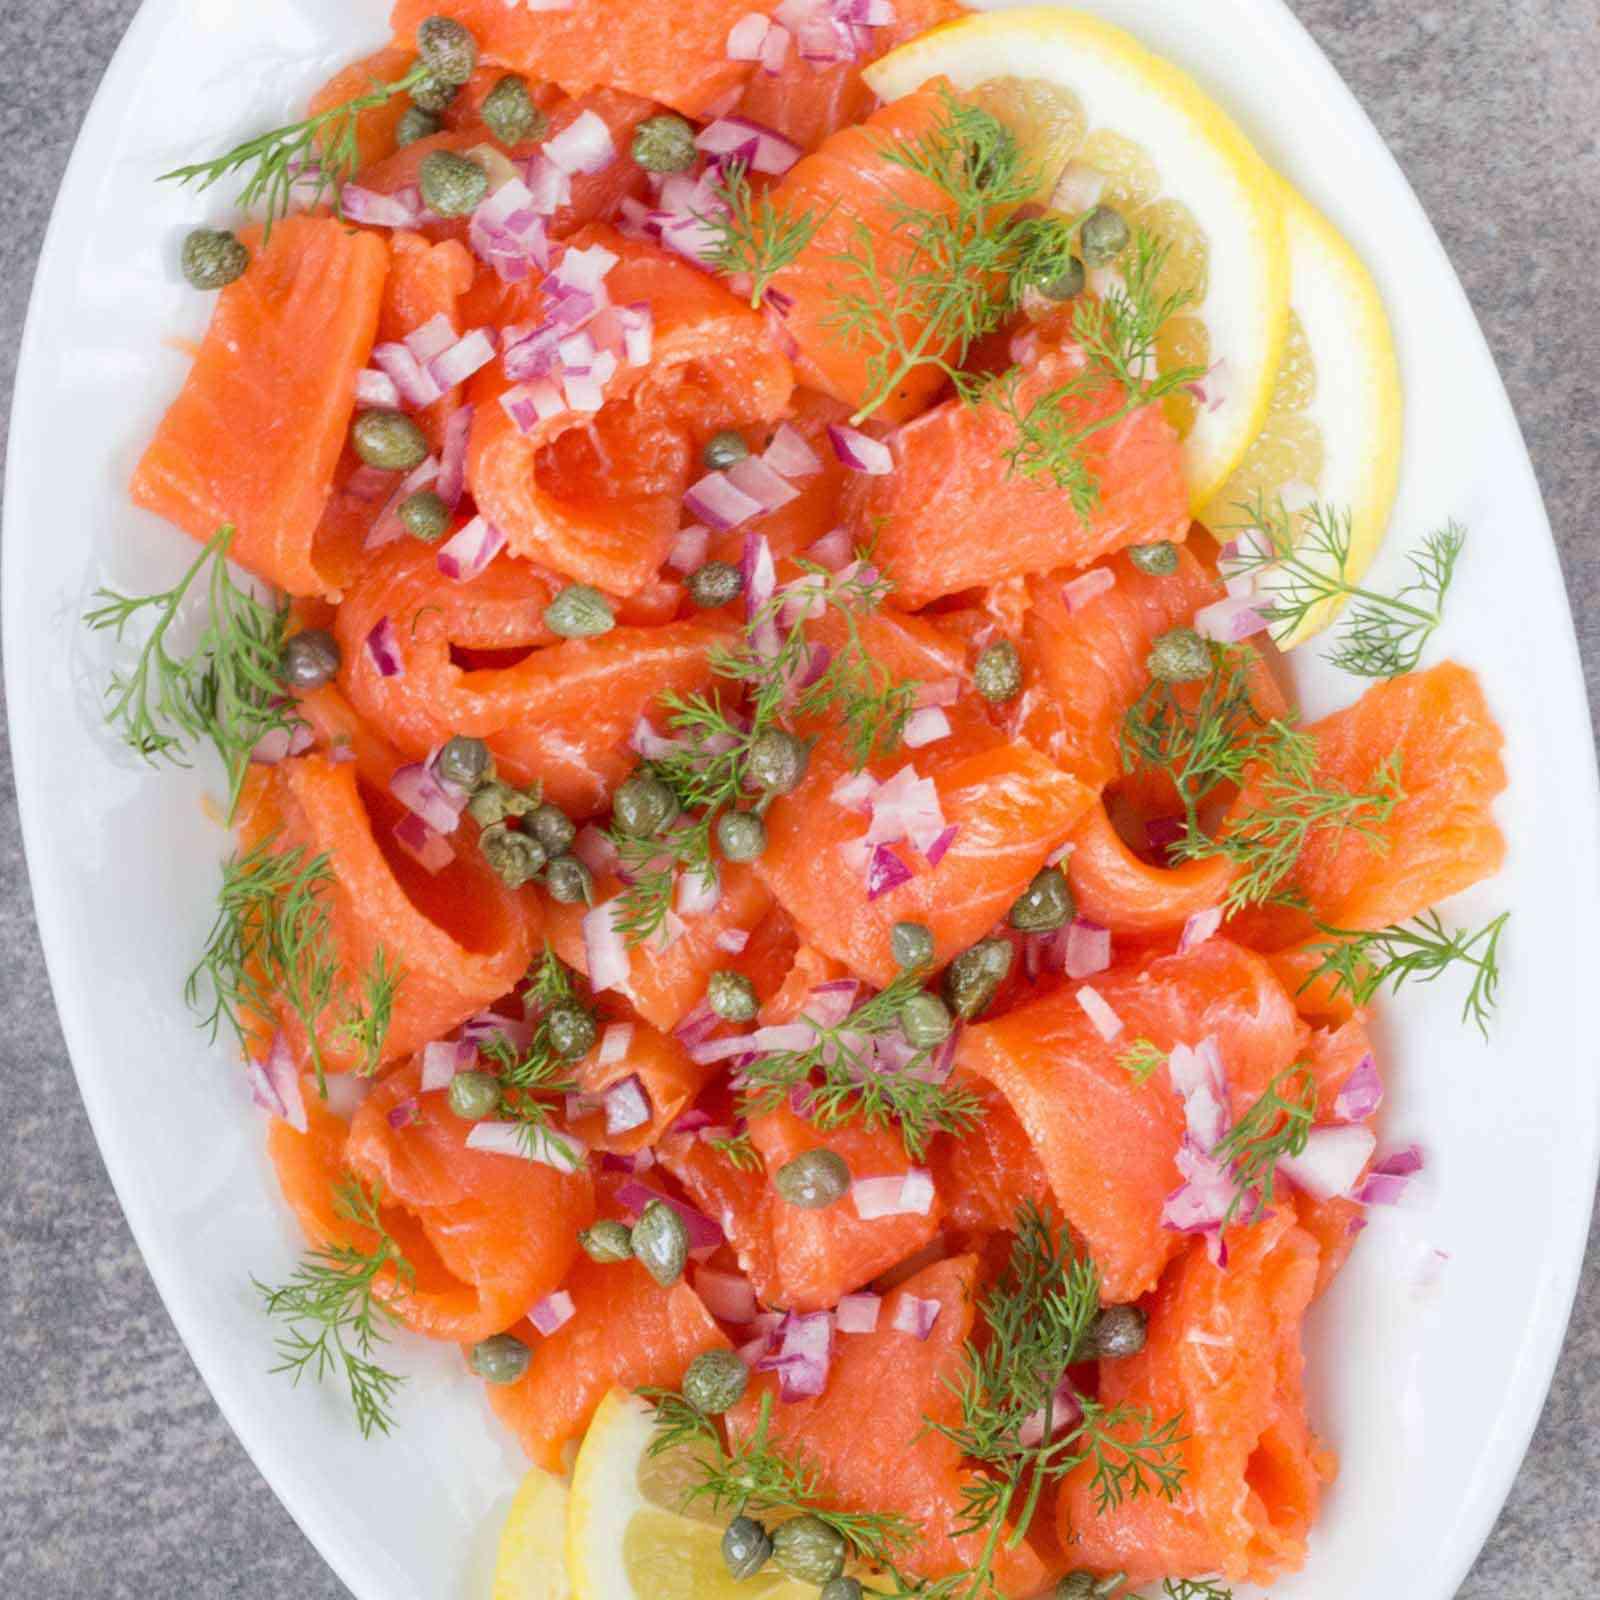 How to Make Salmon Gravlax